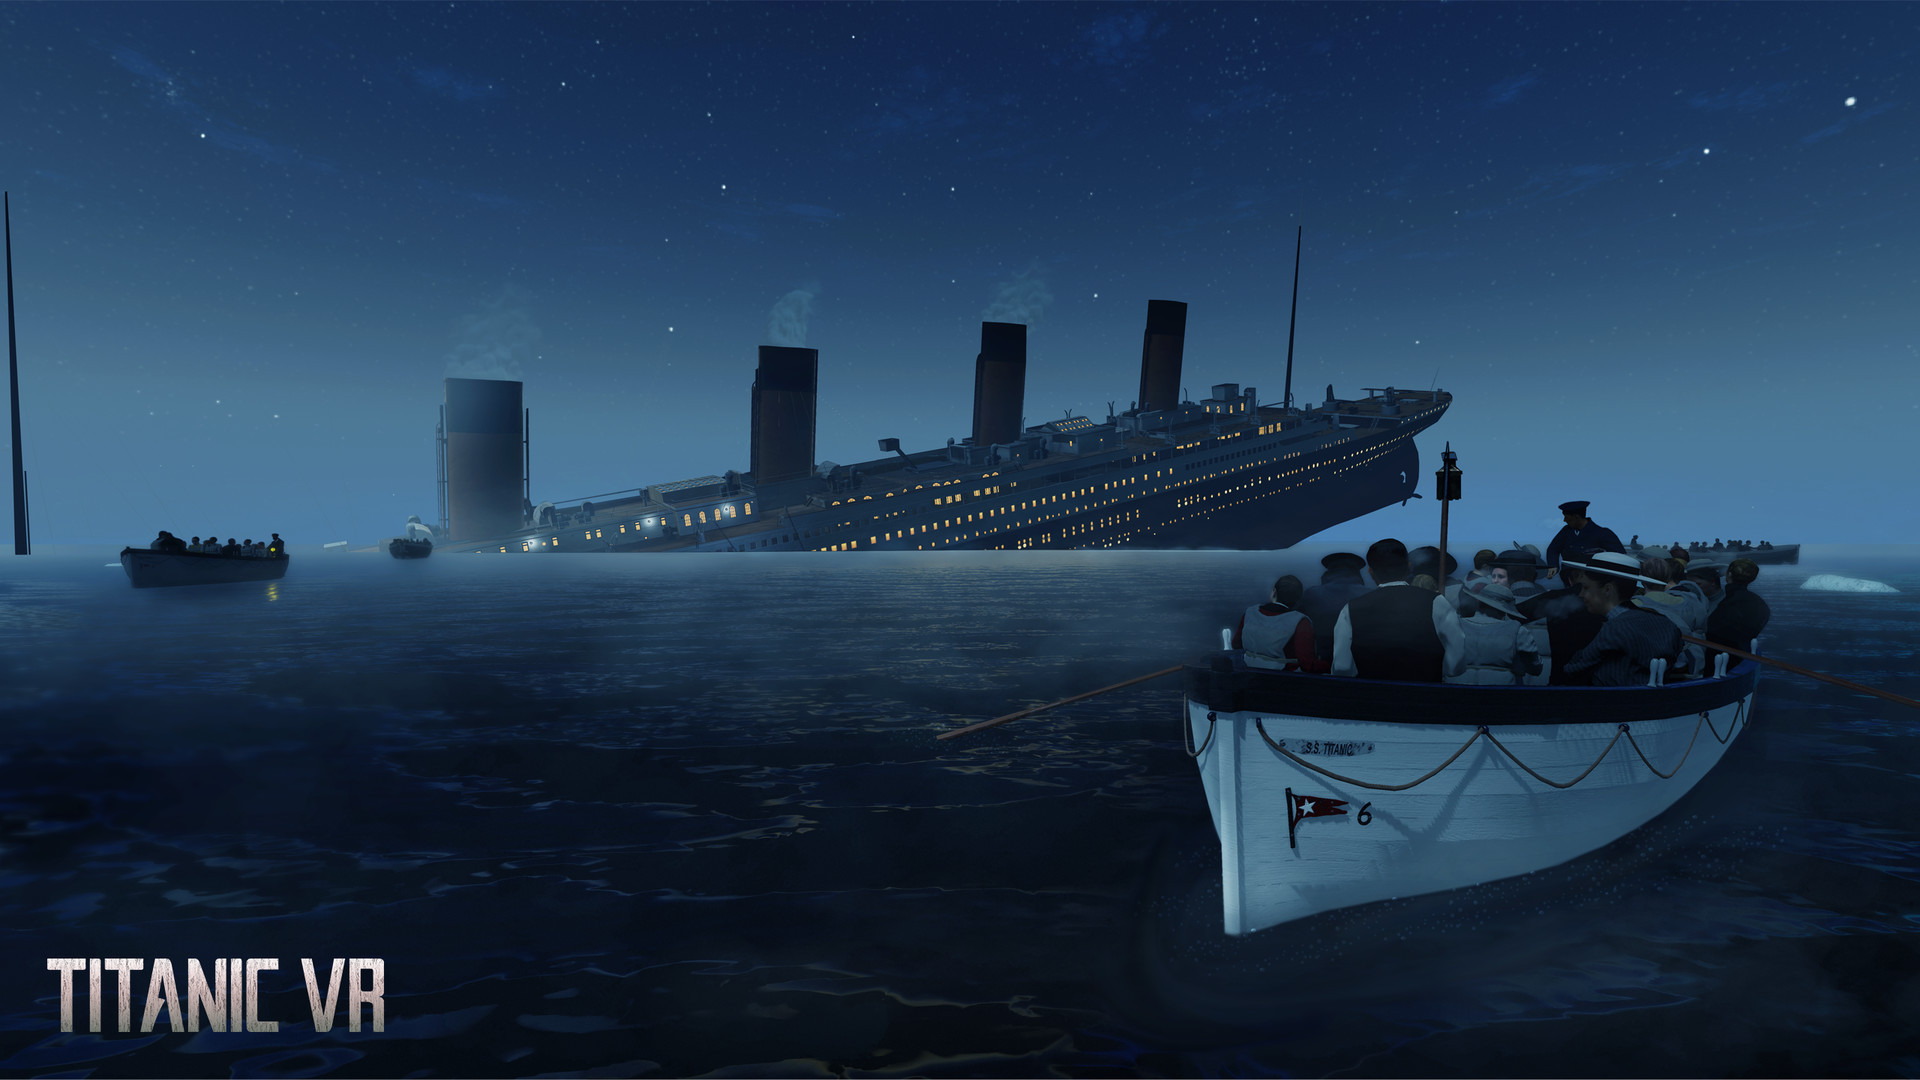 titanicvr3.jpg